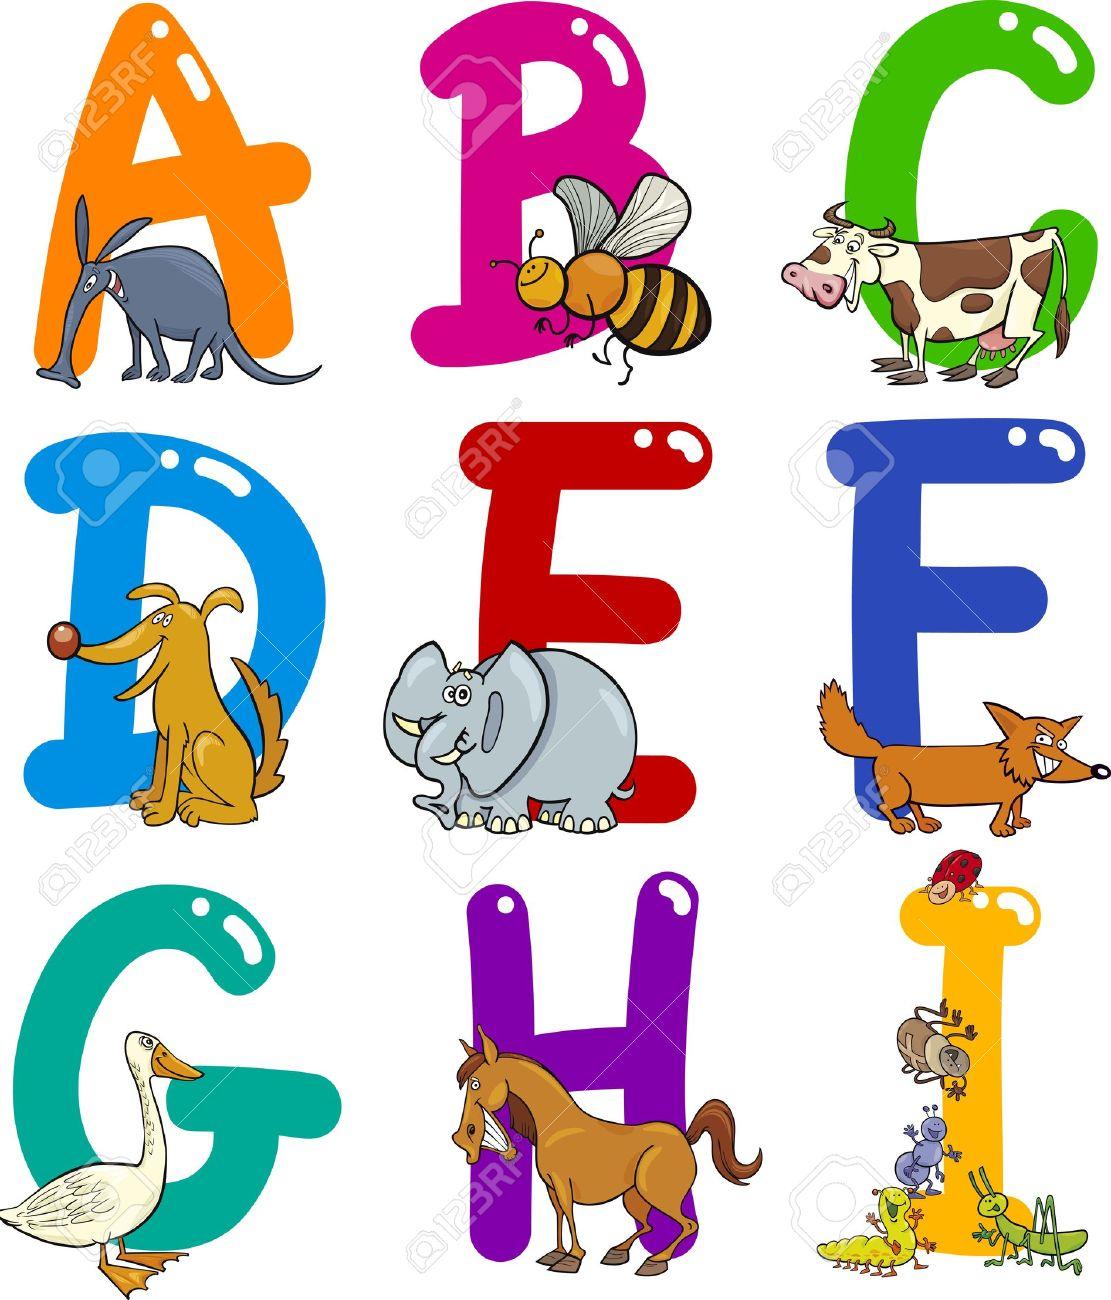 alphabet cartoon images u0026 stock pictures royalty free alphabet